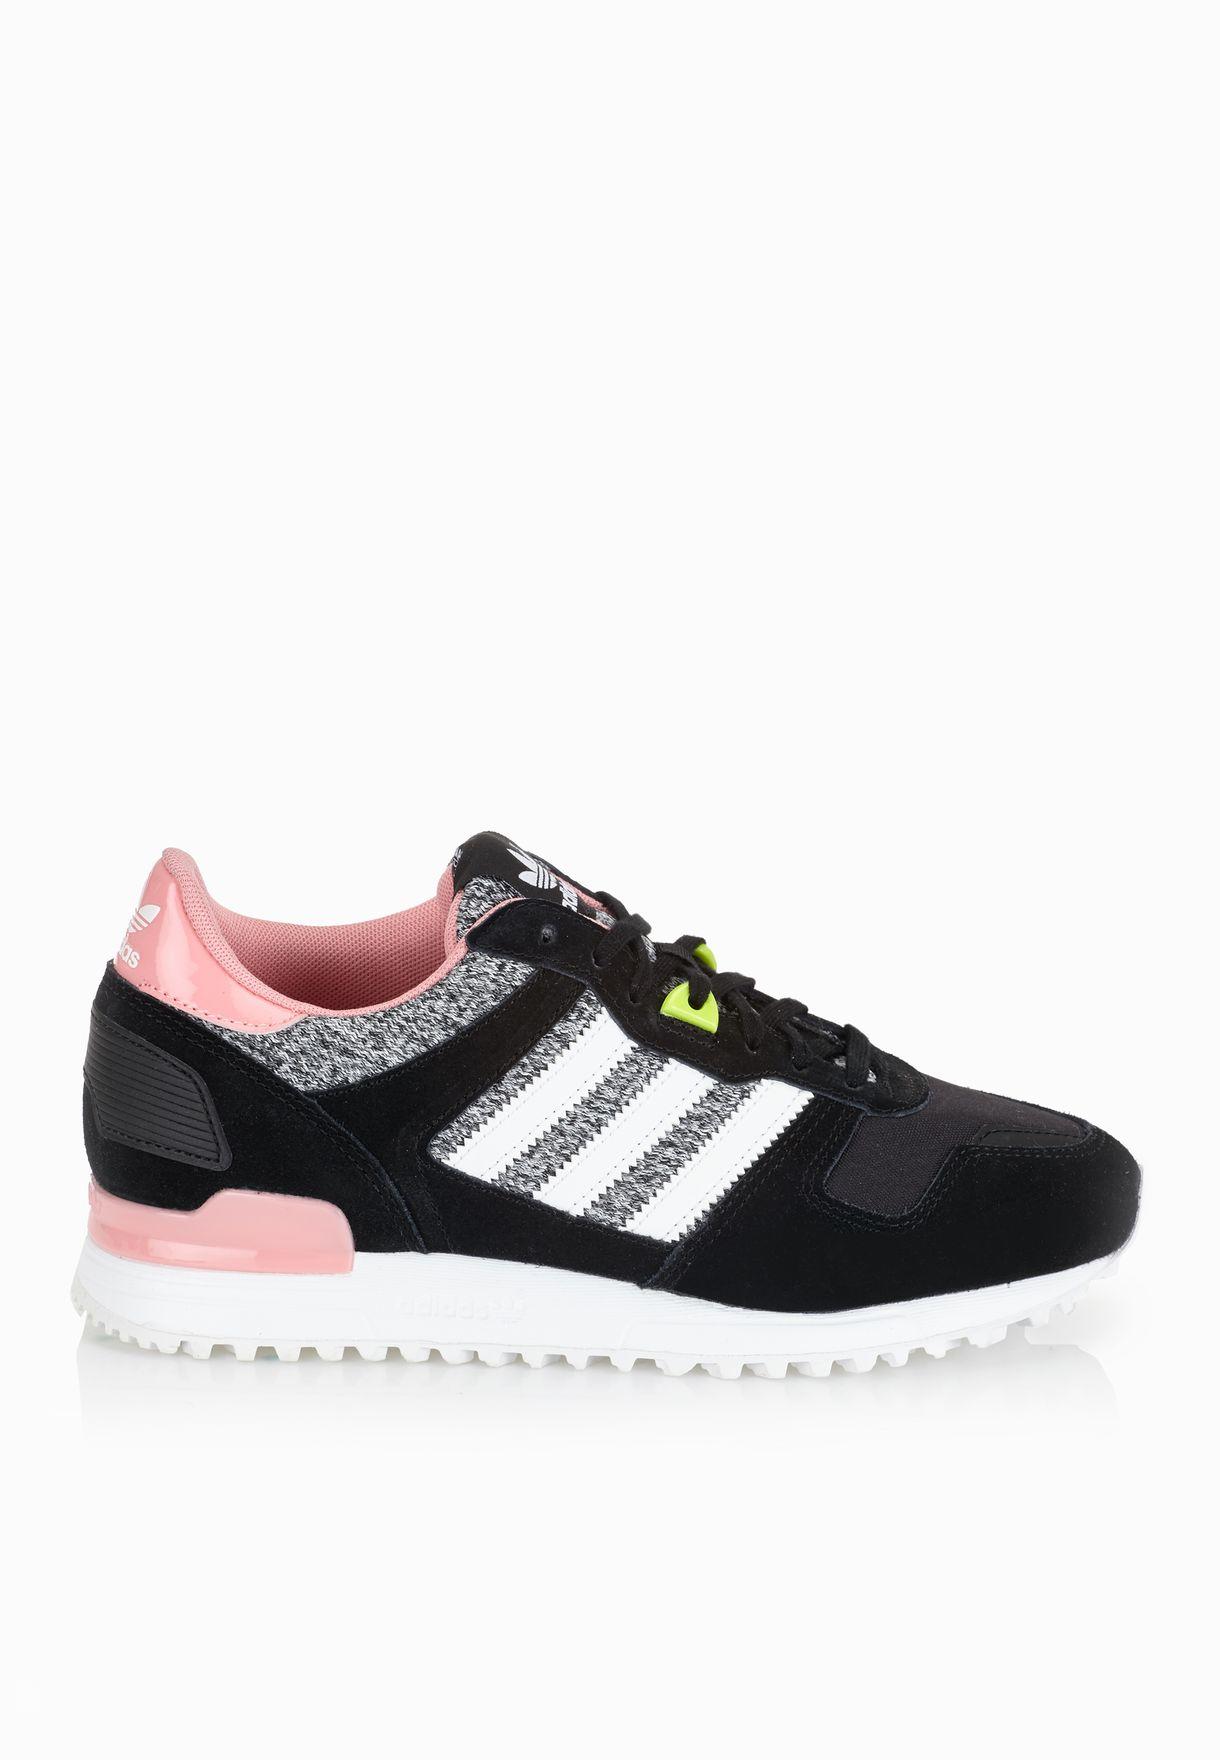 5a9f8573a Shop adidas Originals multicolor ZX 700 Sneakers B25716 for Women in ...